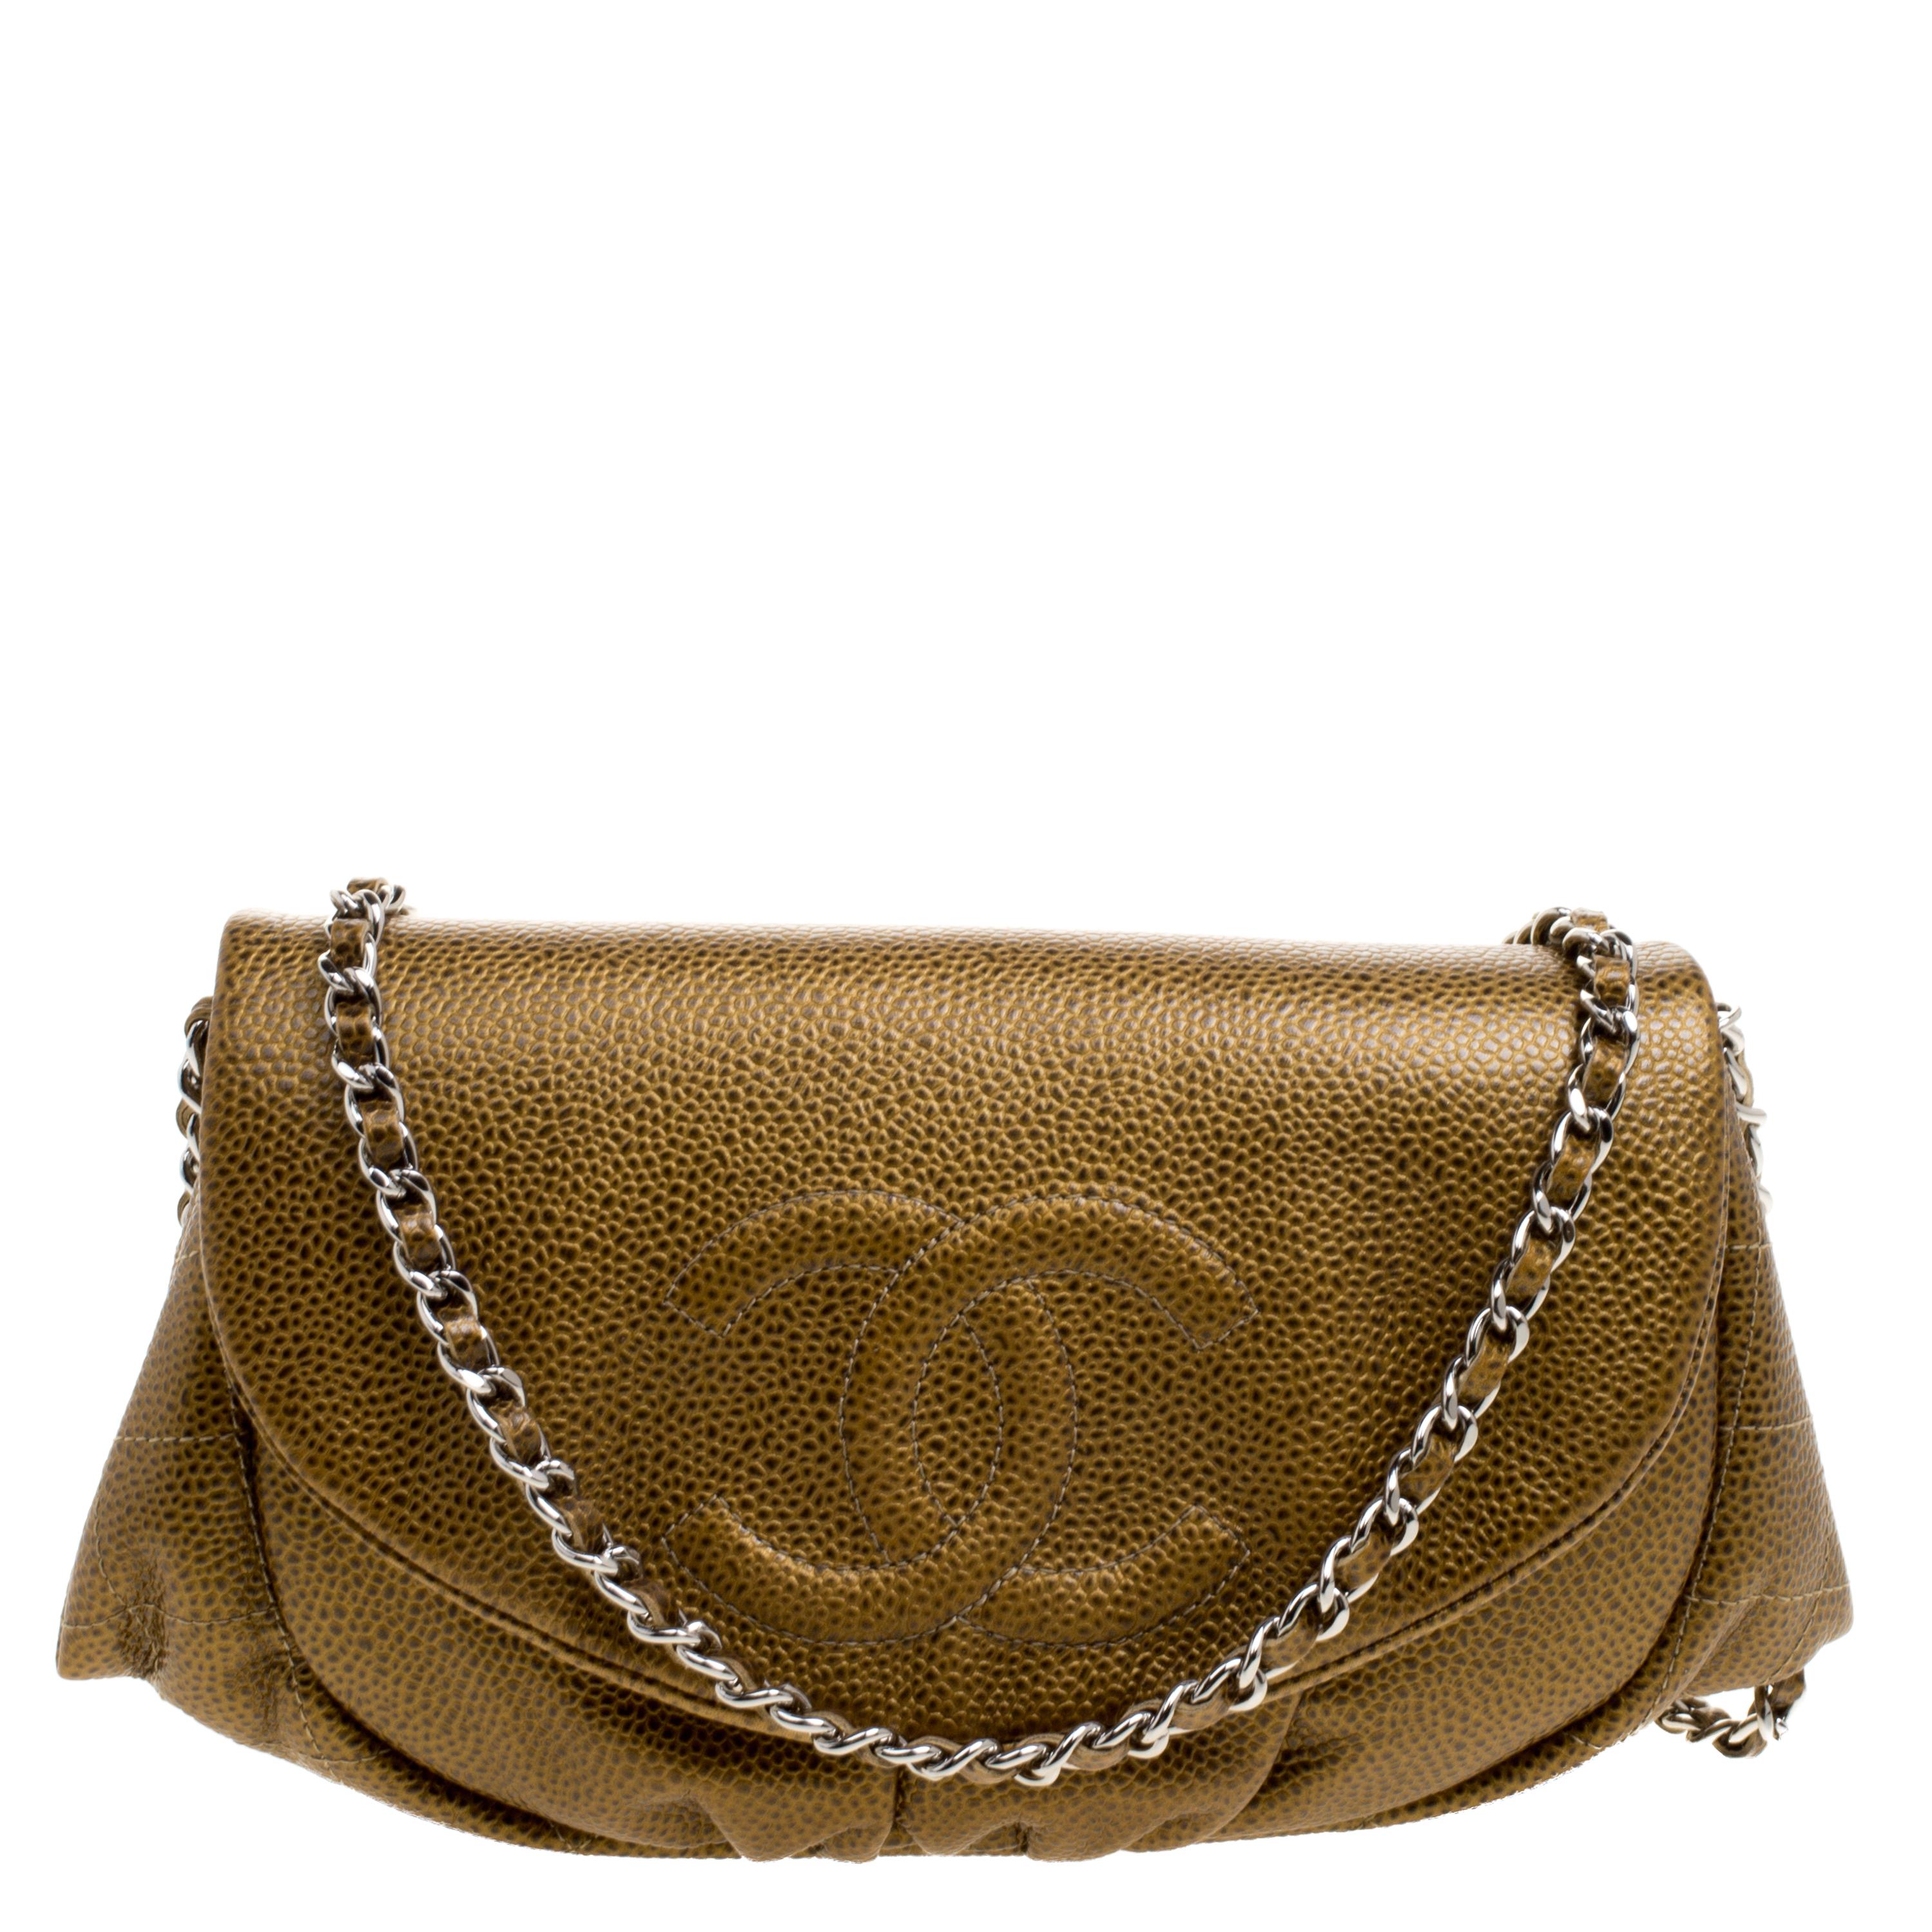 bdbc5f22f3b4 Buy Chanel Gold Leather Halfmoon WOC Bag 110668 at best price | TLC